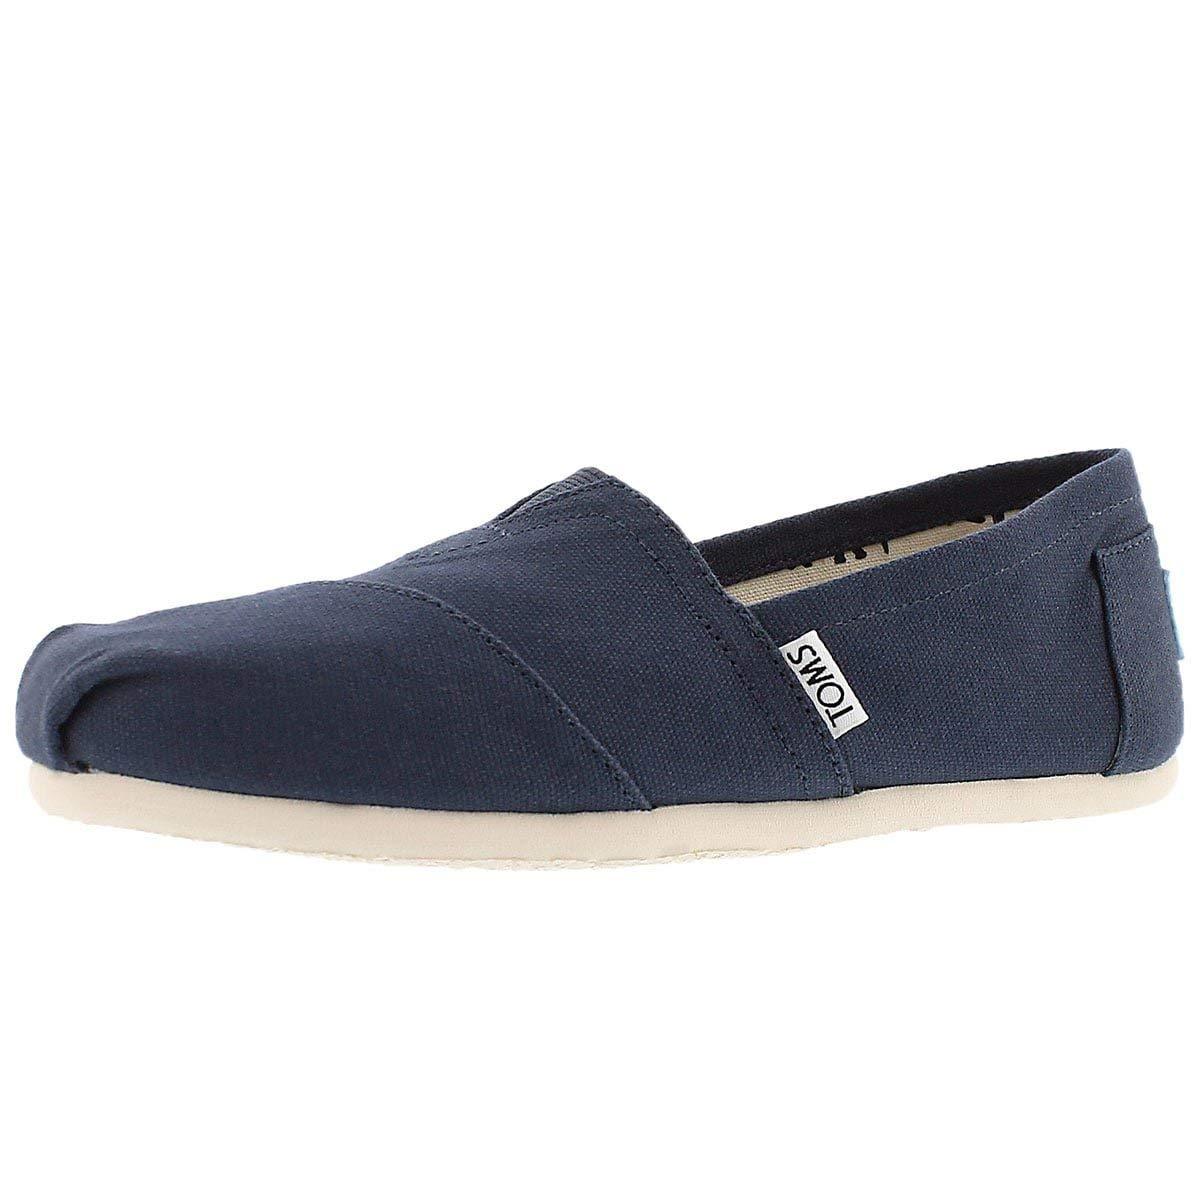 competitive price 73d5c 47926 Amazon.com   TOMS Women s Classic Canvas Ankle-High Flat Shoe   Shoes